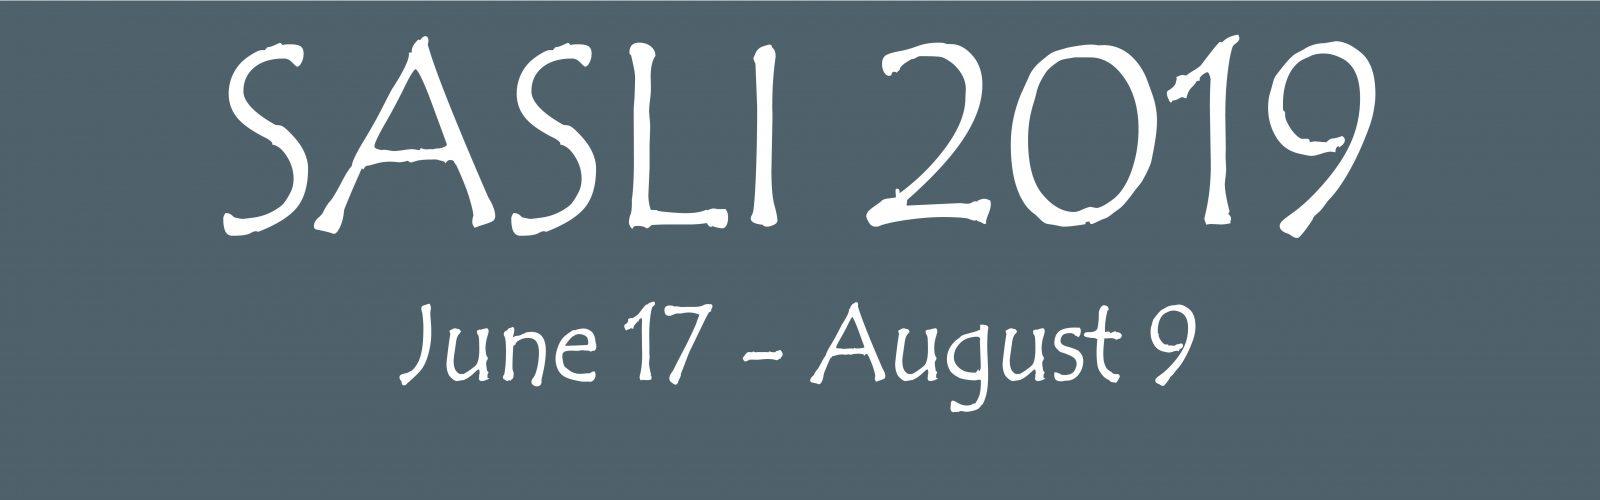 SASLI 2019 June 17-August 9 banner